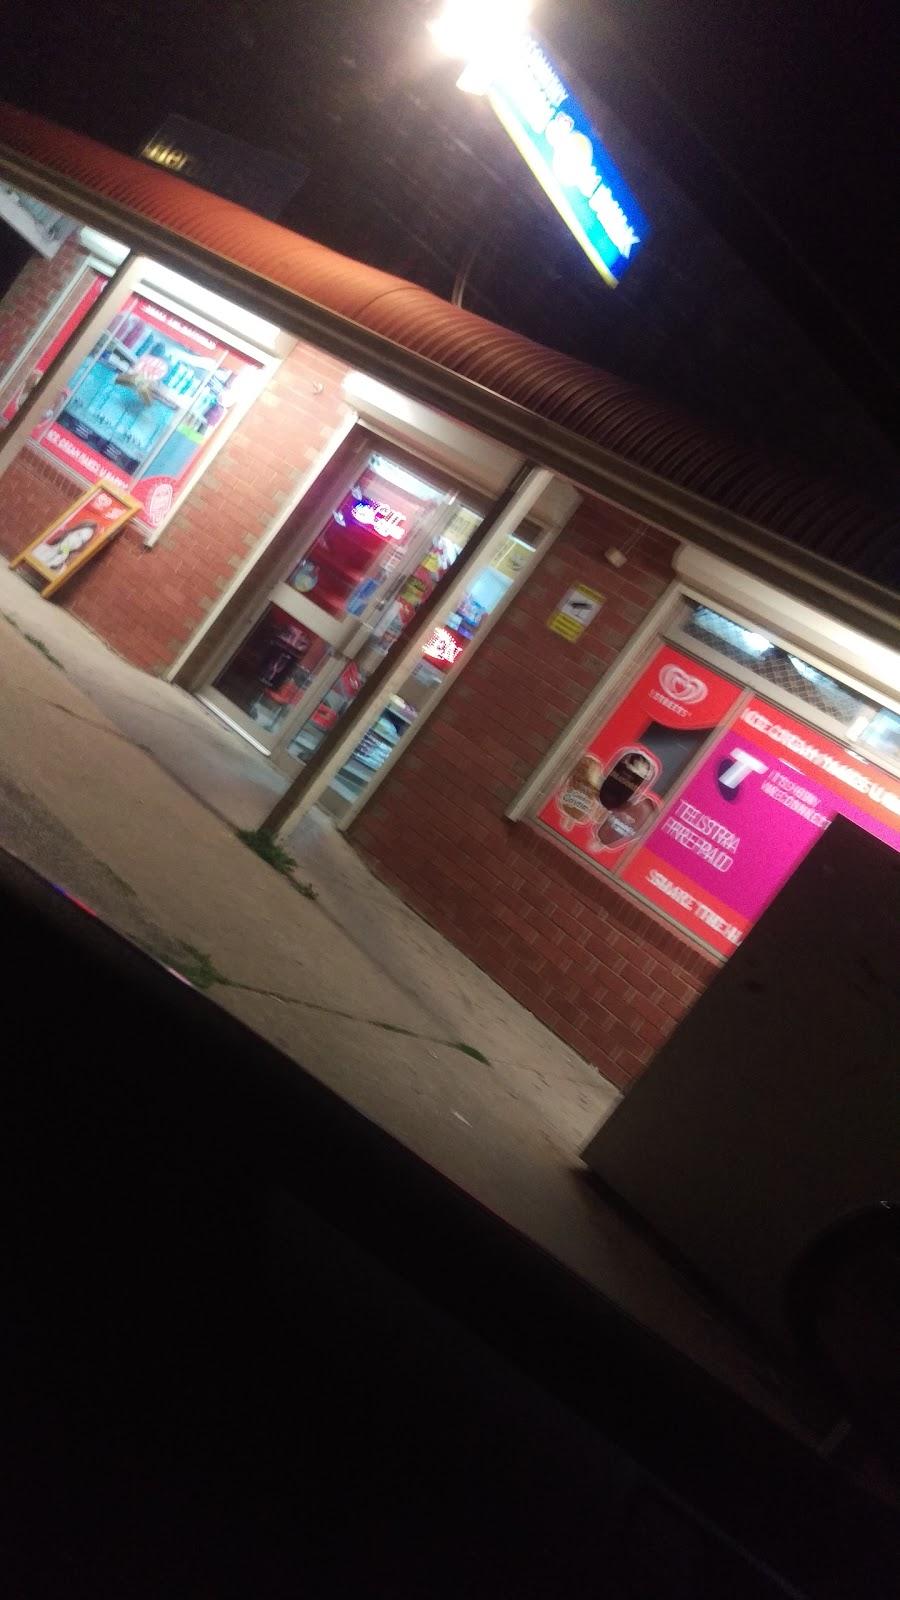 Kirkton Drive Milkbar | supermarket | 203 Gisborne-Melton Rd, Kurunjang VIC 3337, Australia | 0397479017 OR +61 3 9747 9017